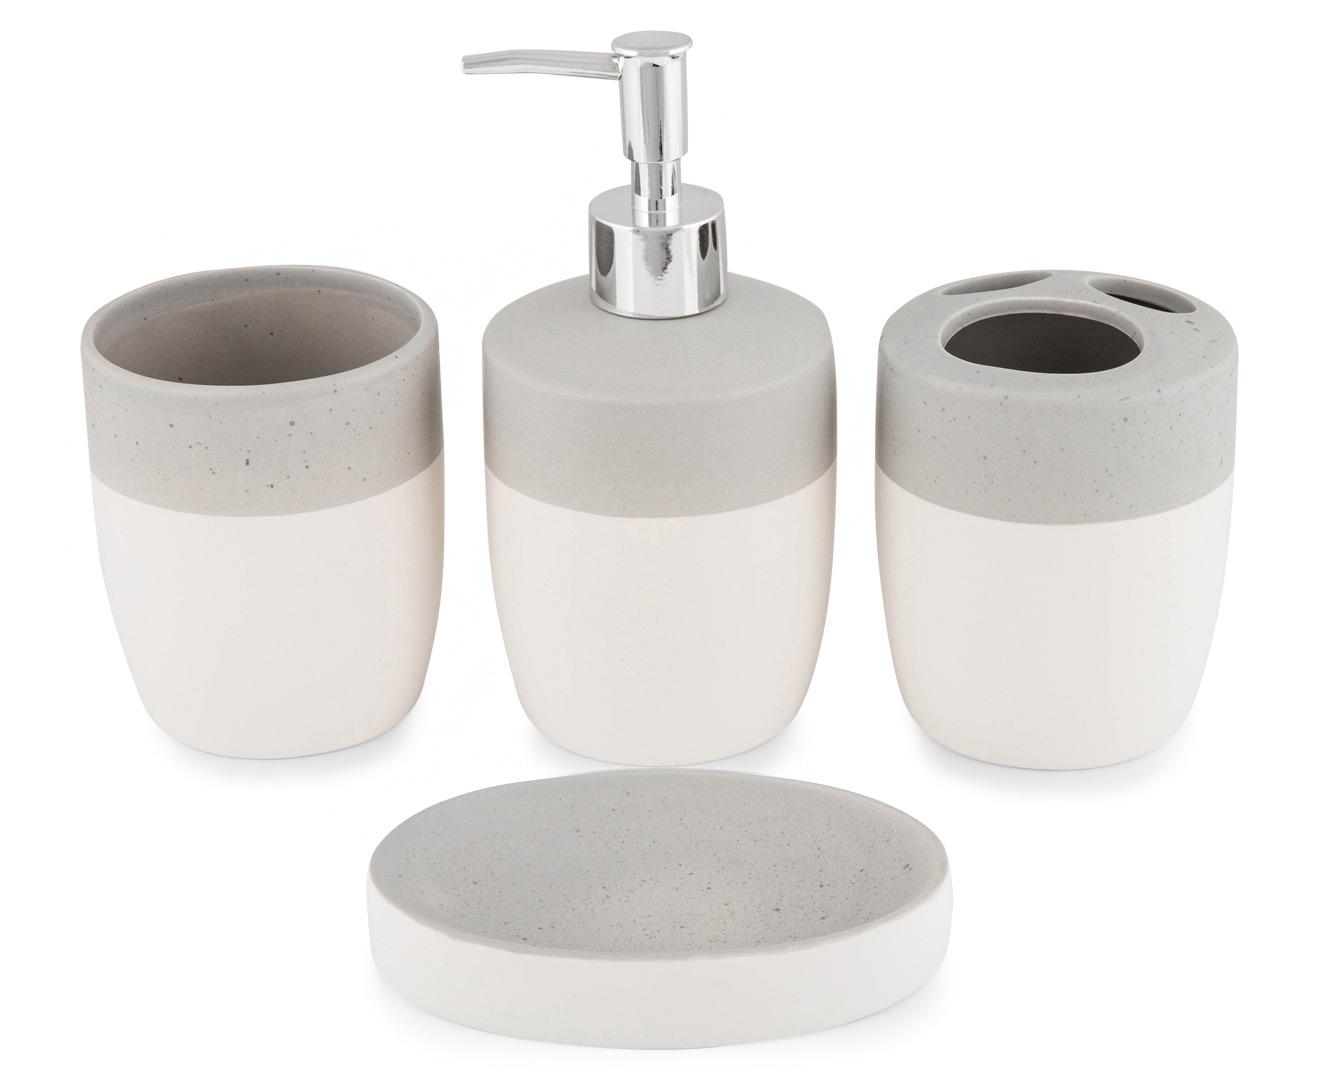 Cooper & Co. Bathroom Accessories 4-Pack - White/Concrete | Catch.com.au